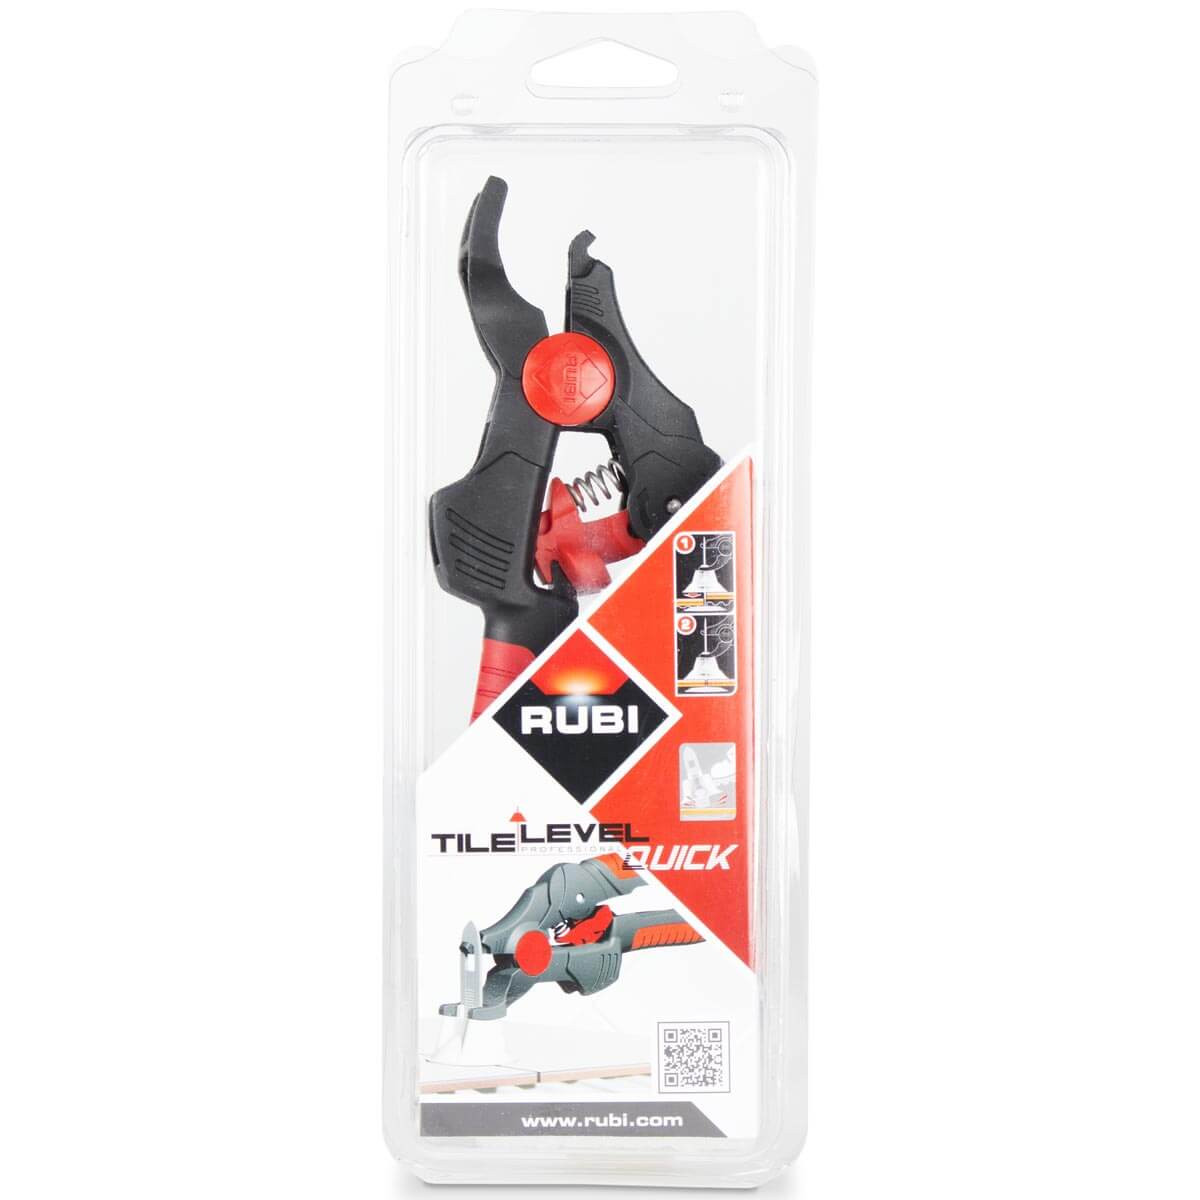 Rubi Tile Leveling Nippers 02989